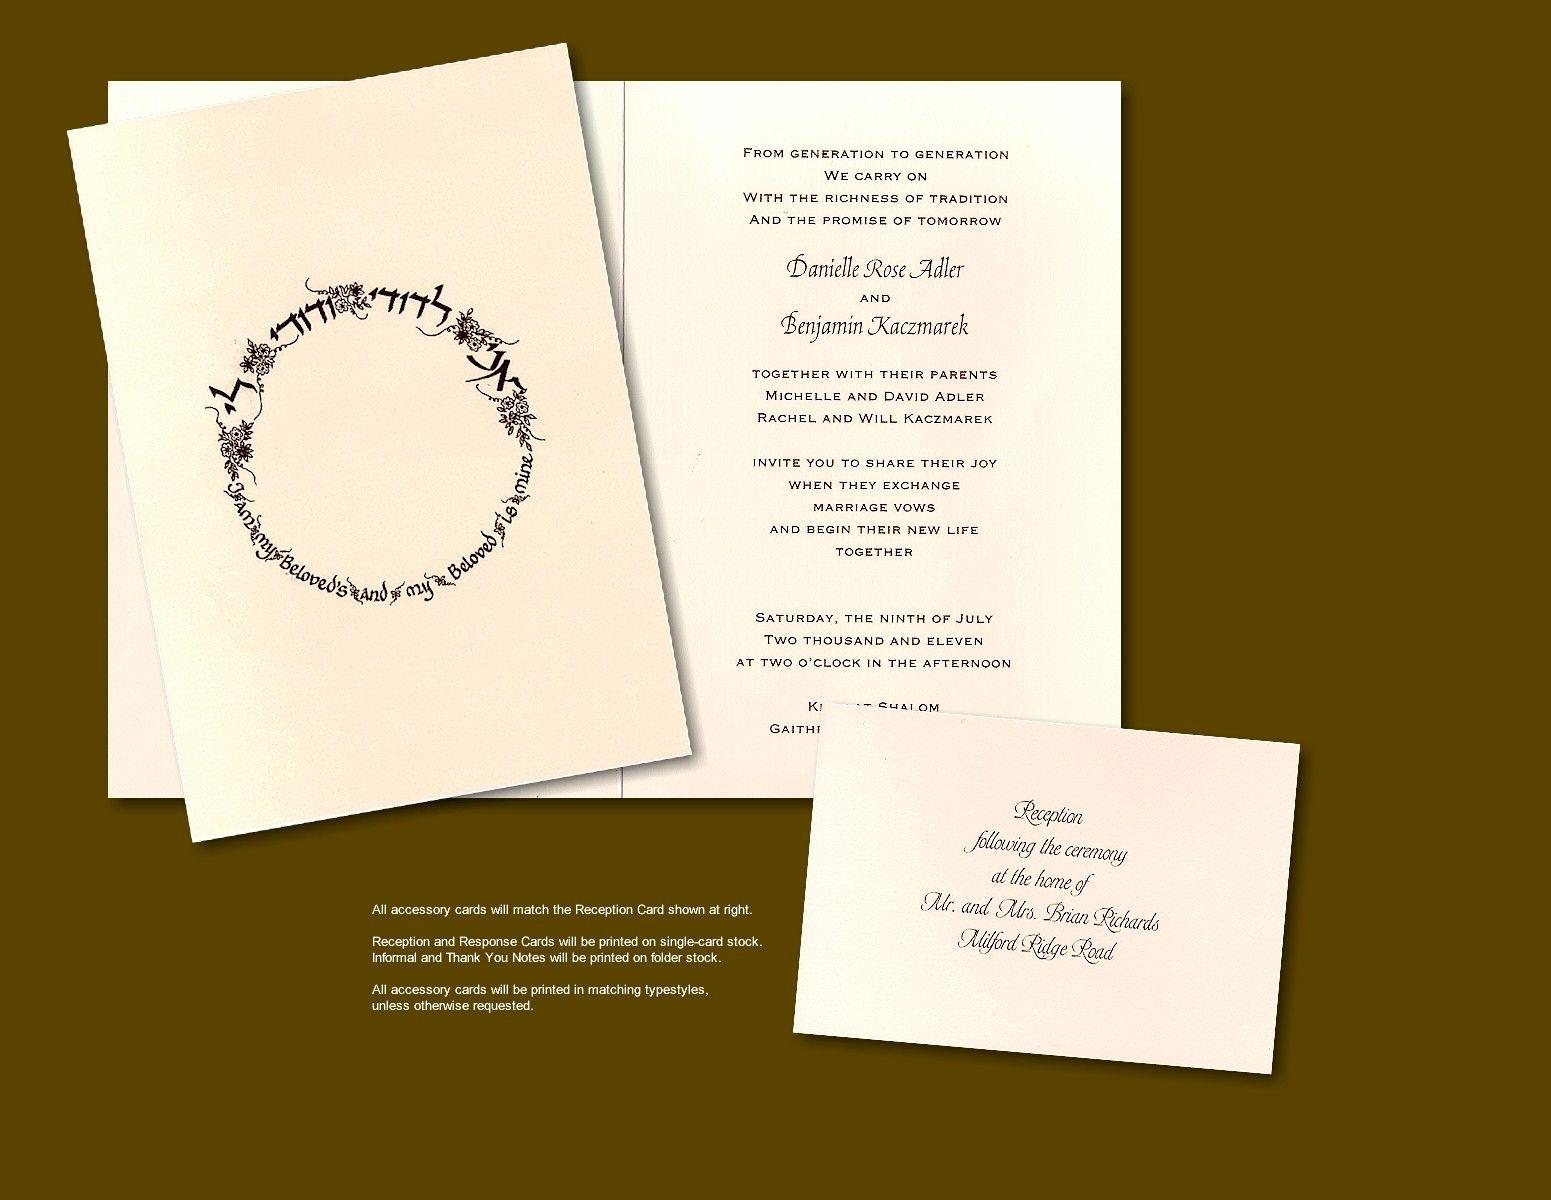 Song Of Solomon Jewish Wedding Invitation Discount Wedding Invitations Jewish Wedding Invitations Jewish Wedding